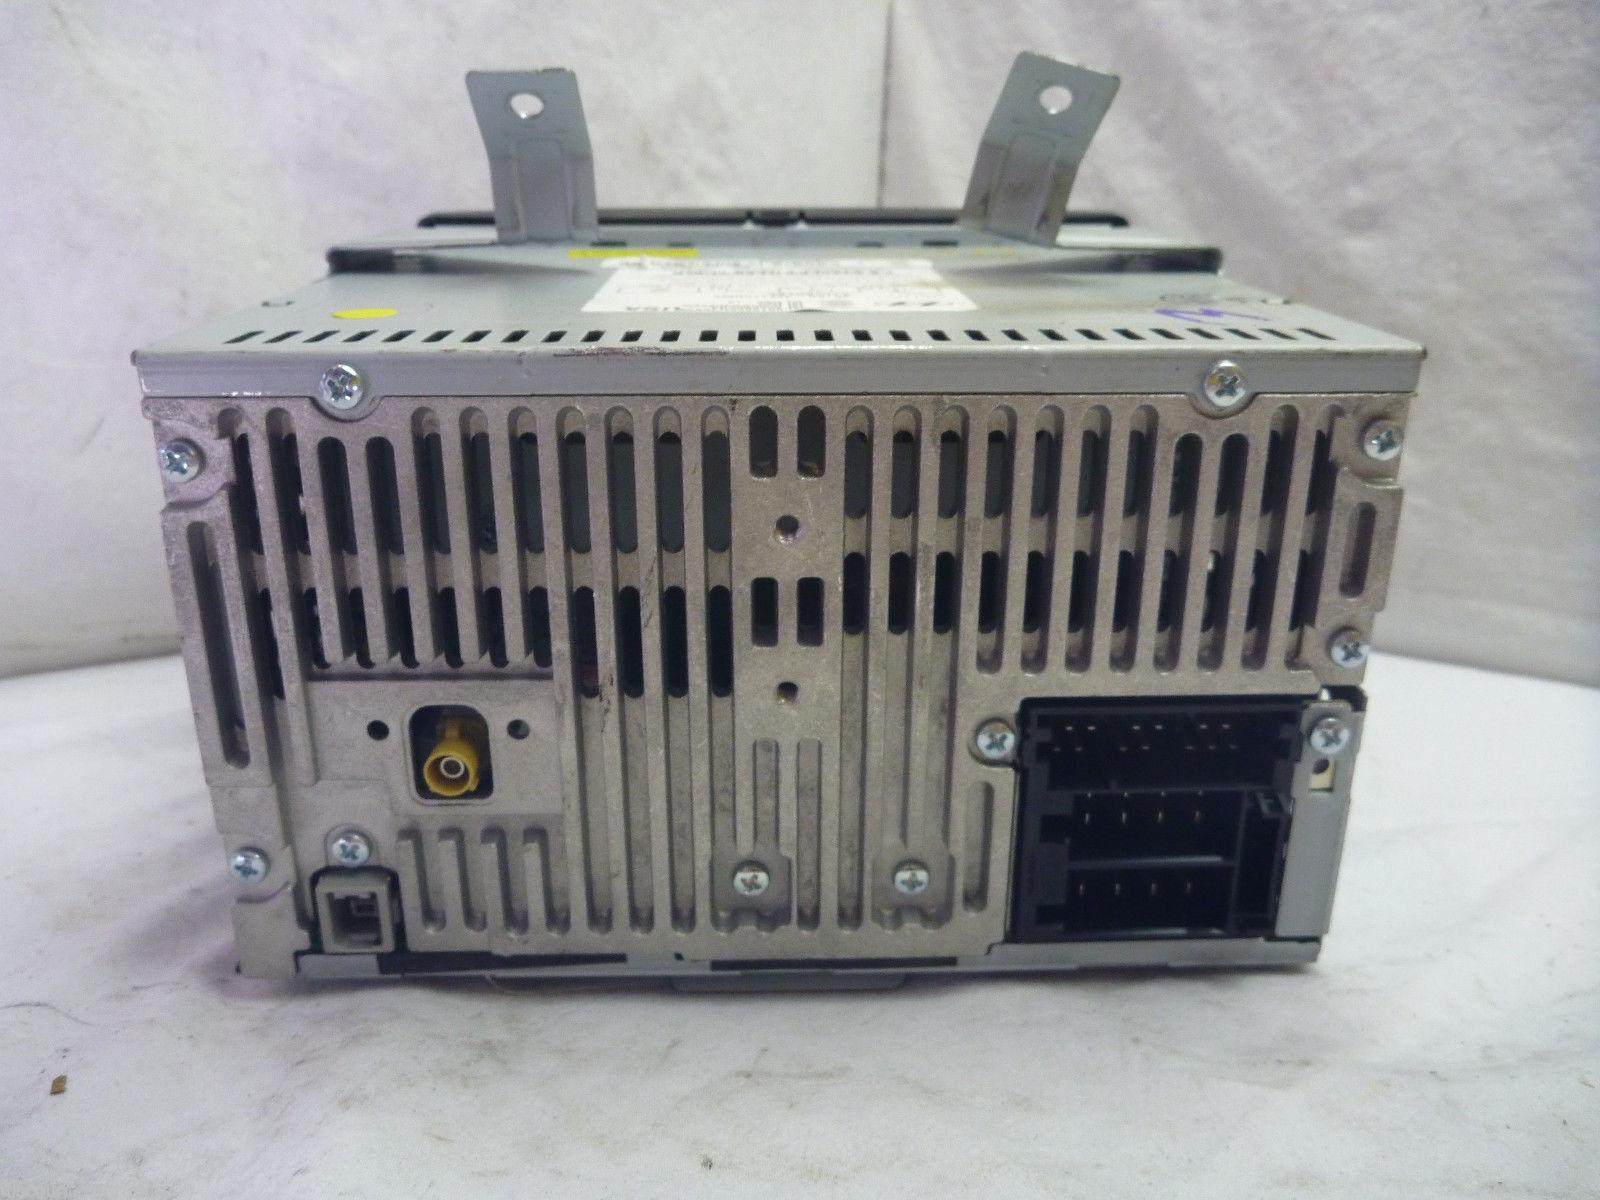 11 12 Hyundai Genesis Radio Cd Player 96180-2M115VM5 C52434